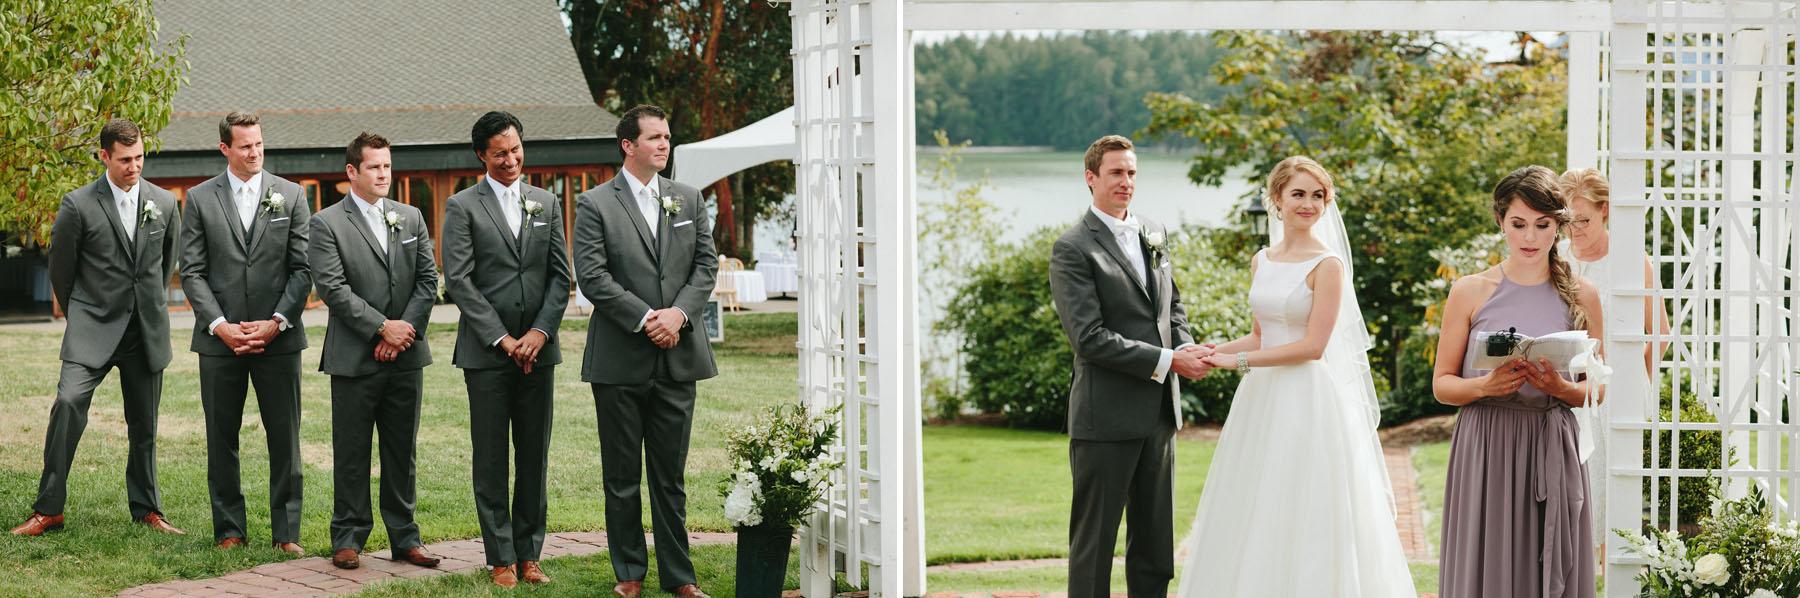 thetis-island-wedding-photographer-rp-rn-085.jpg